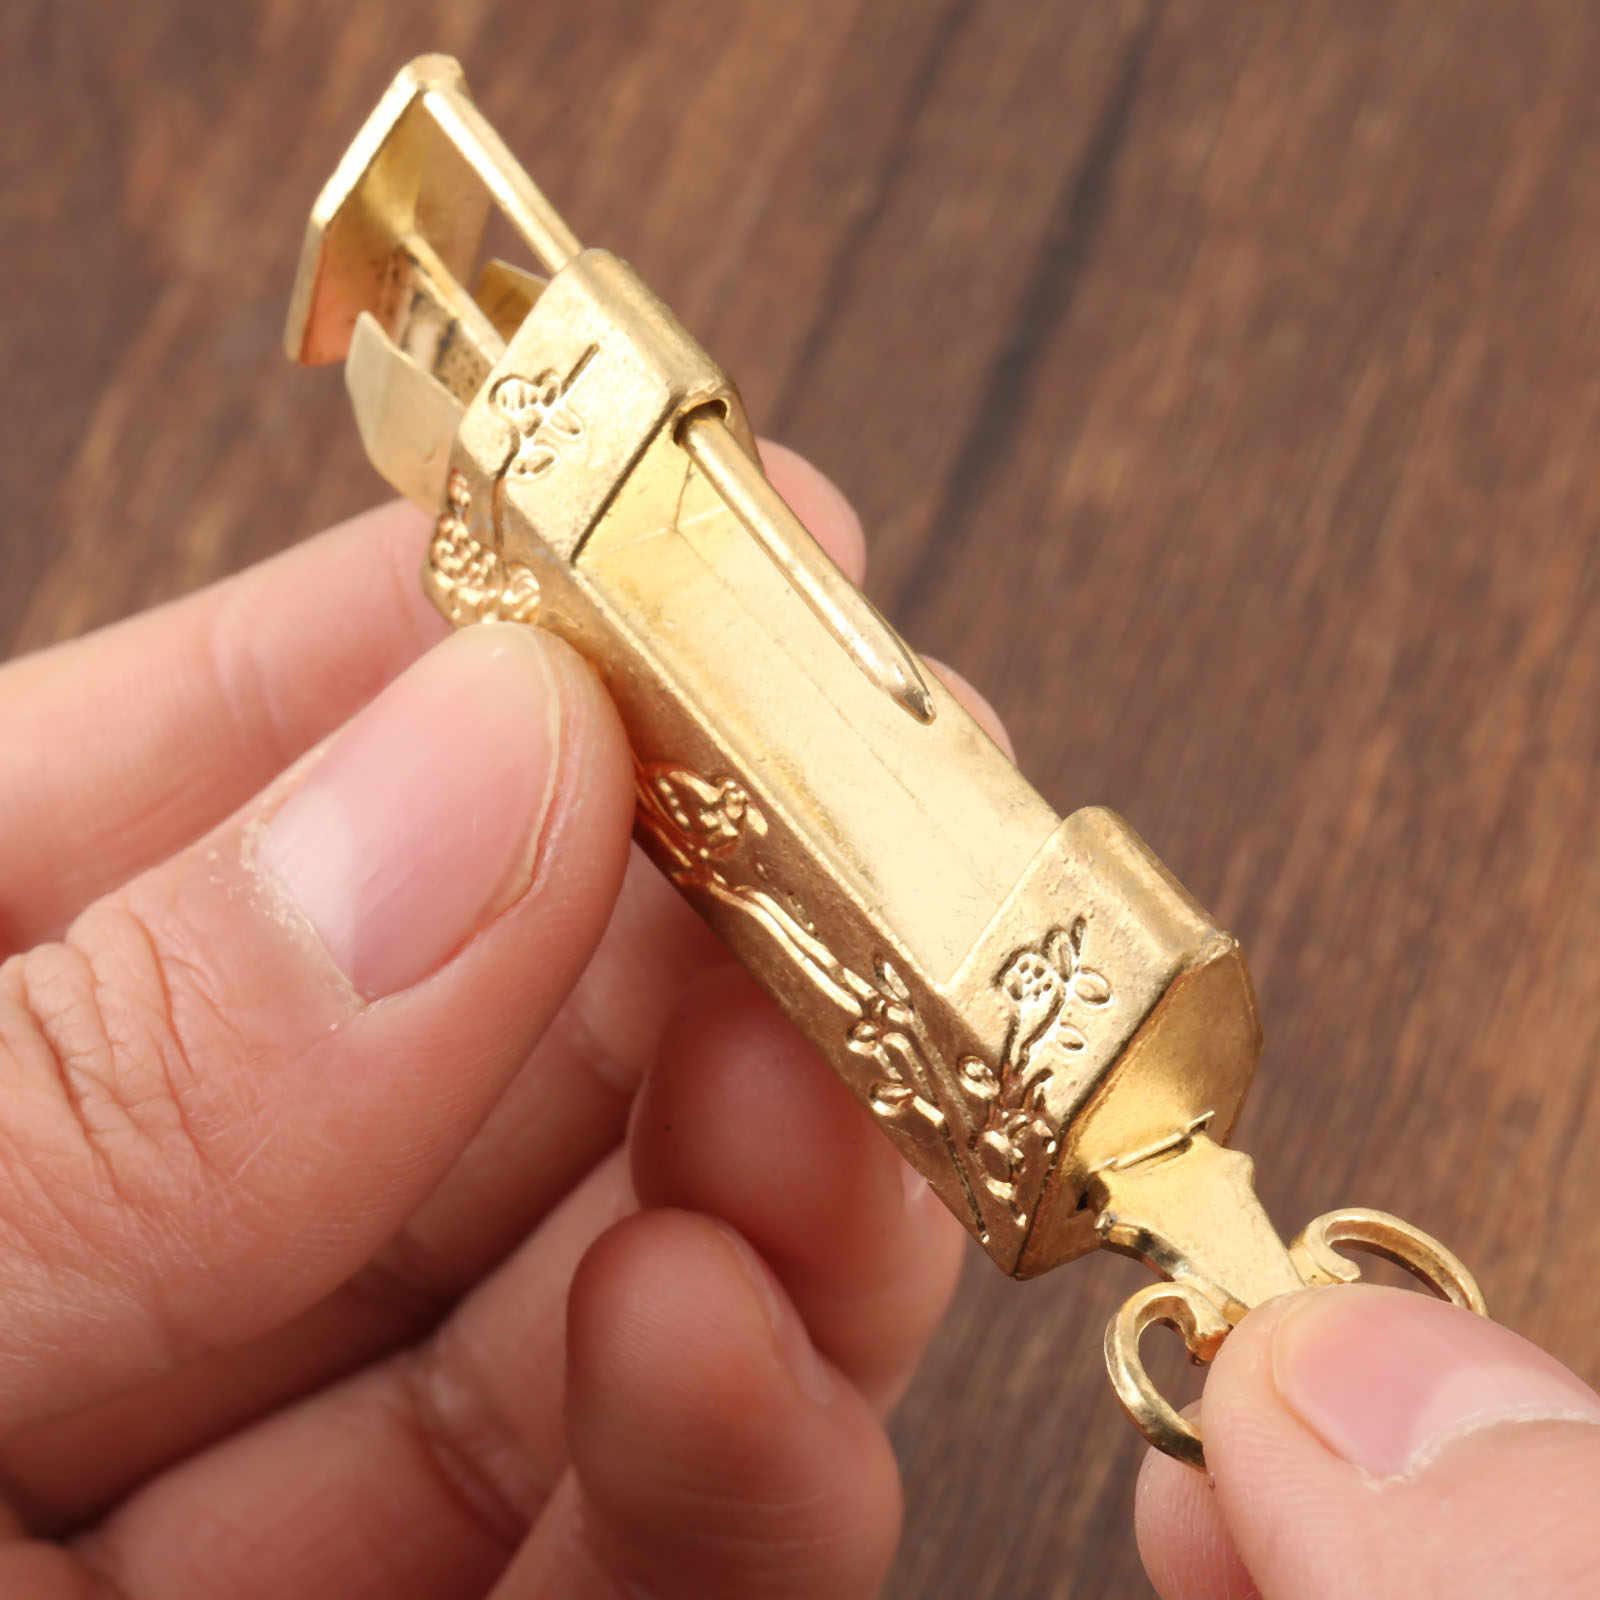 Vintage Gold Chinese Old Lock Retro Brass Padlock Antique Jewelry Wooden Box Padlock Lock Suitcase Door Hardware Locks